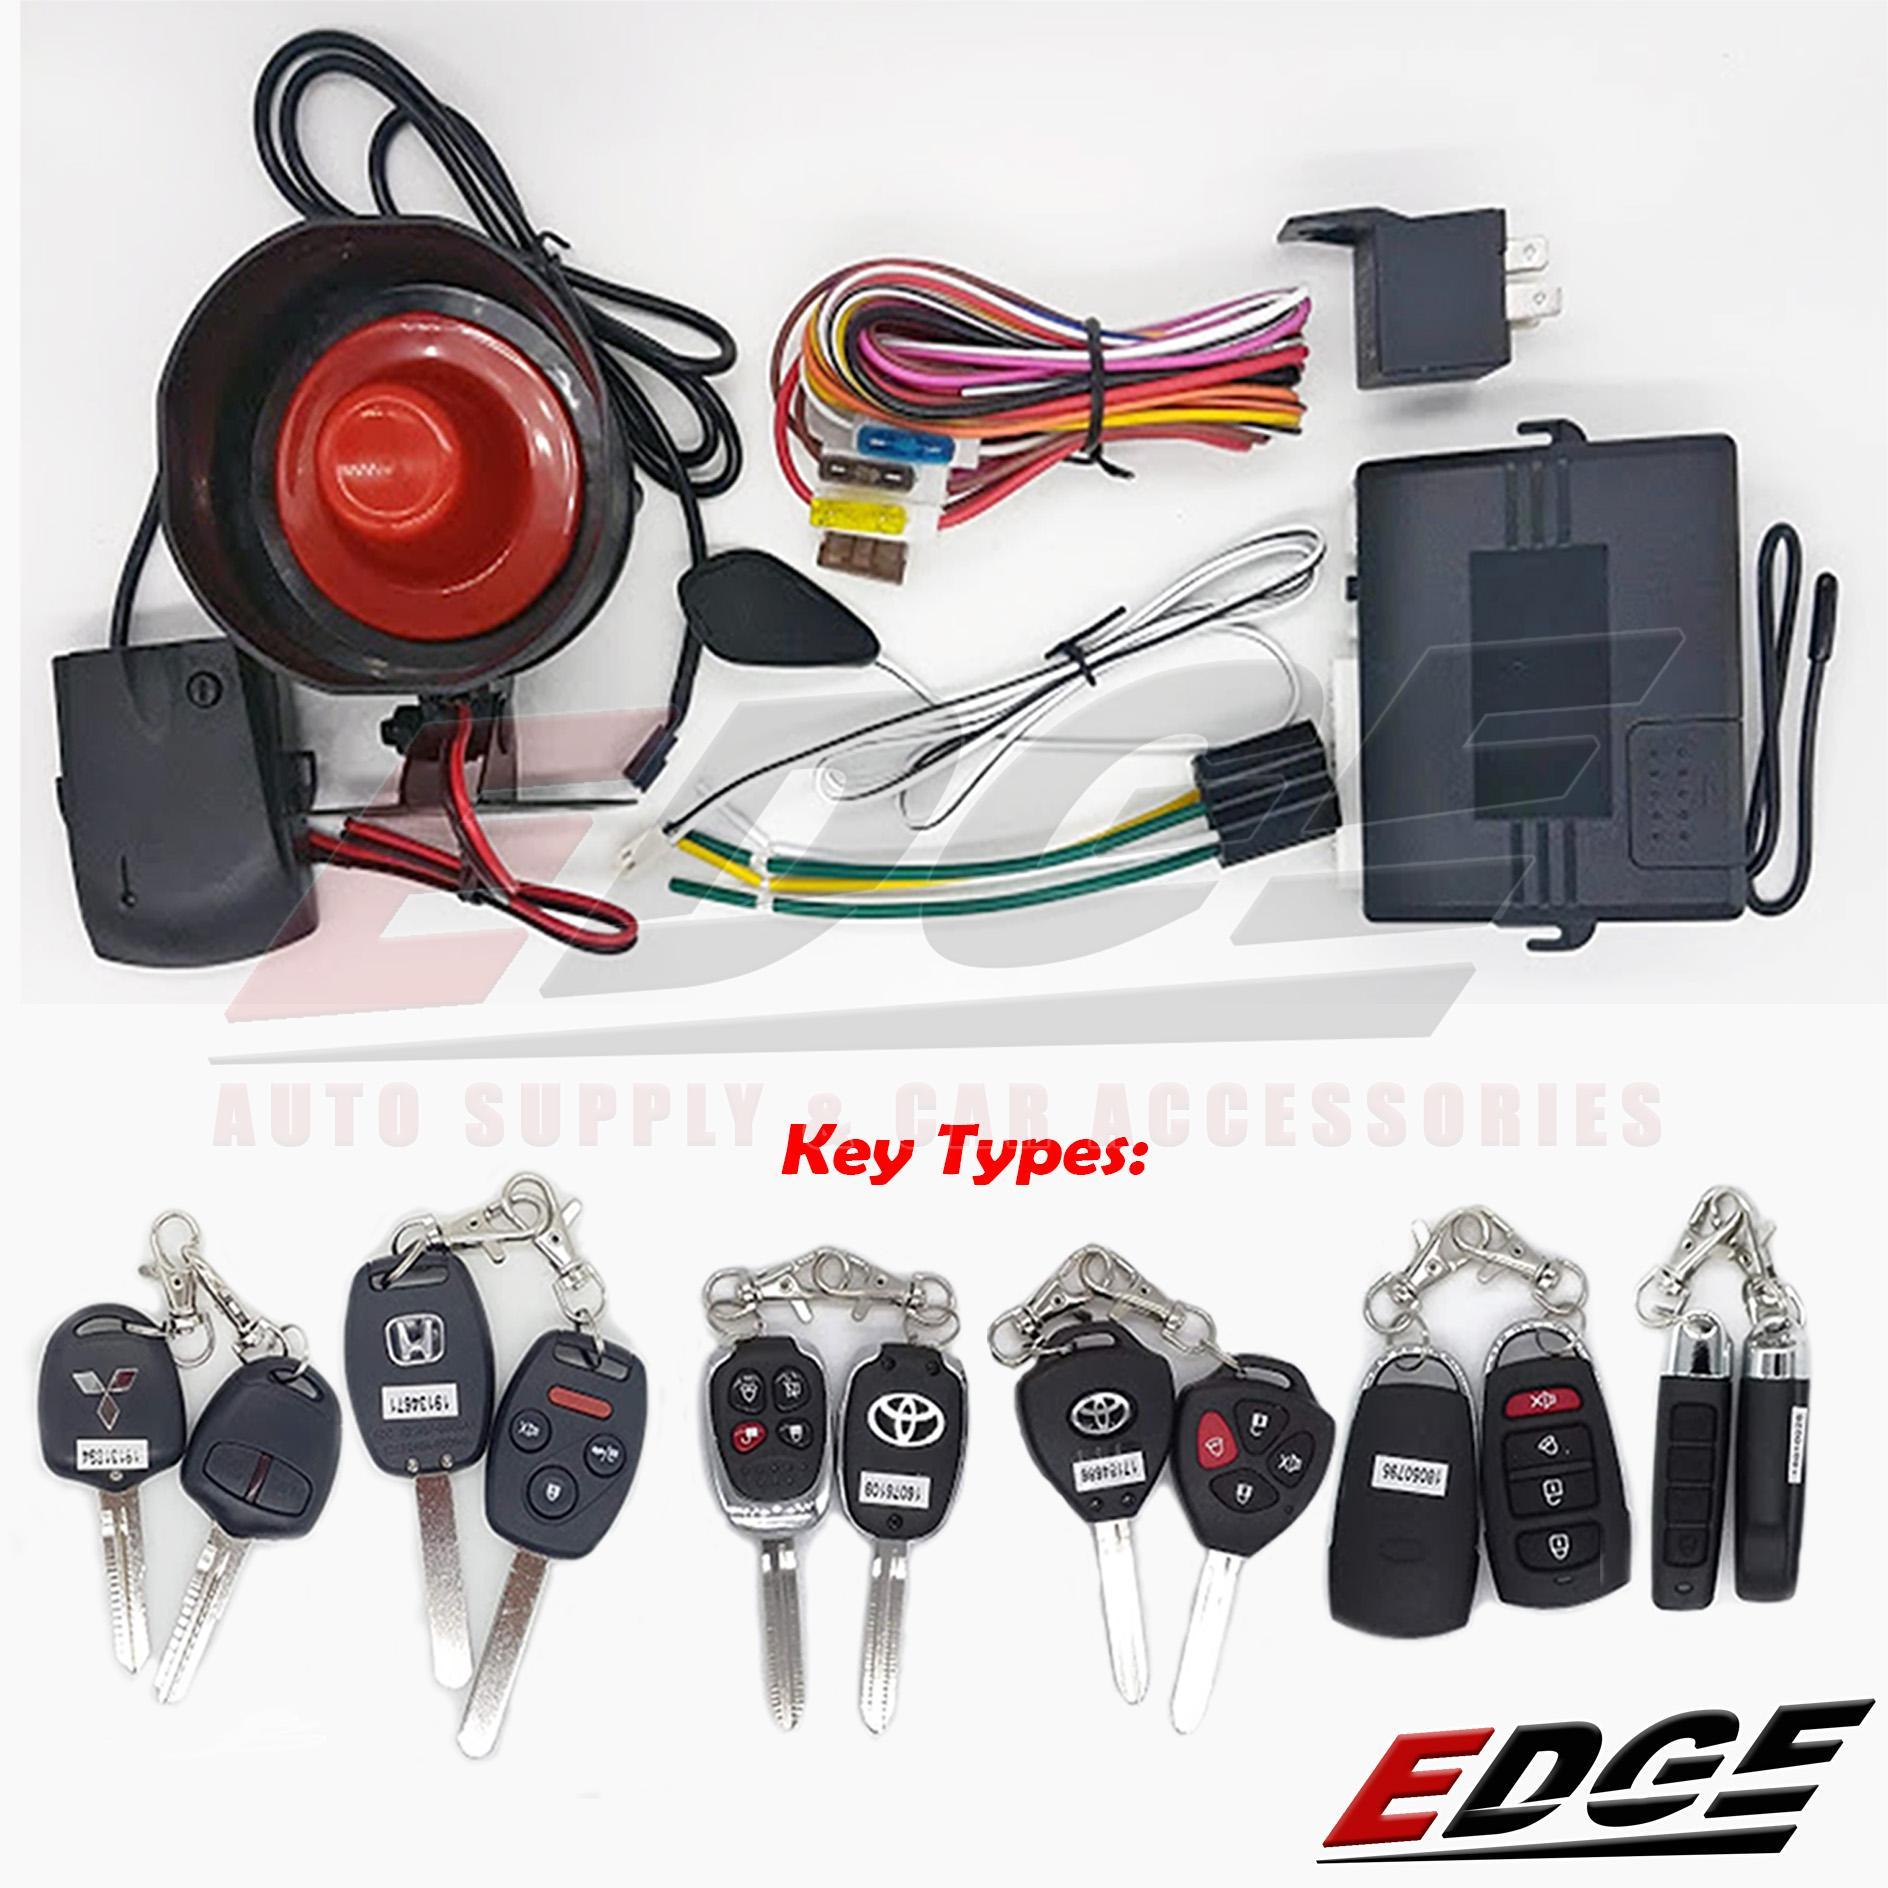 Alarm System for sale - Car Alarm System Accessories Online Deals